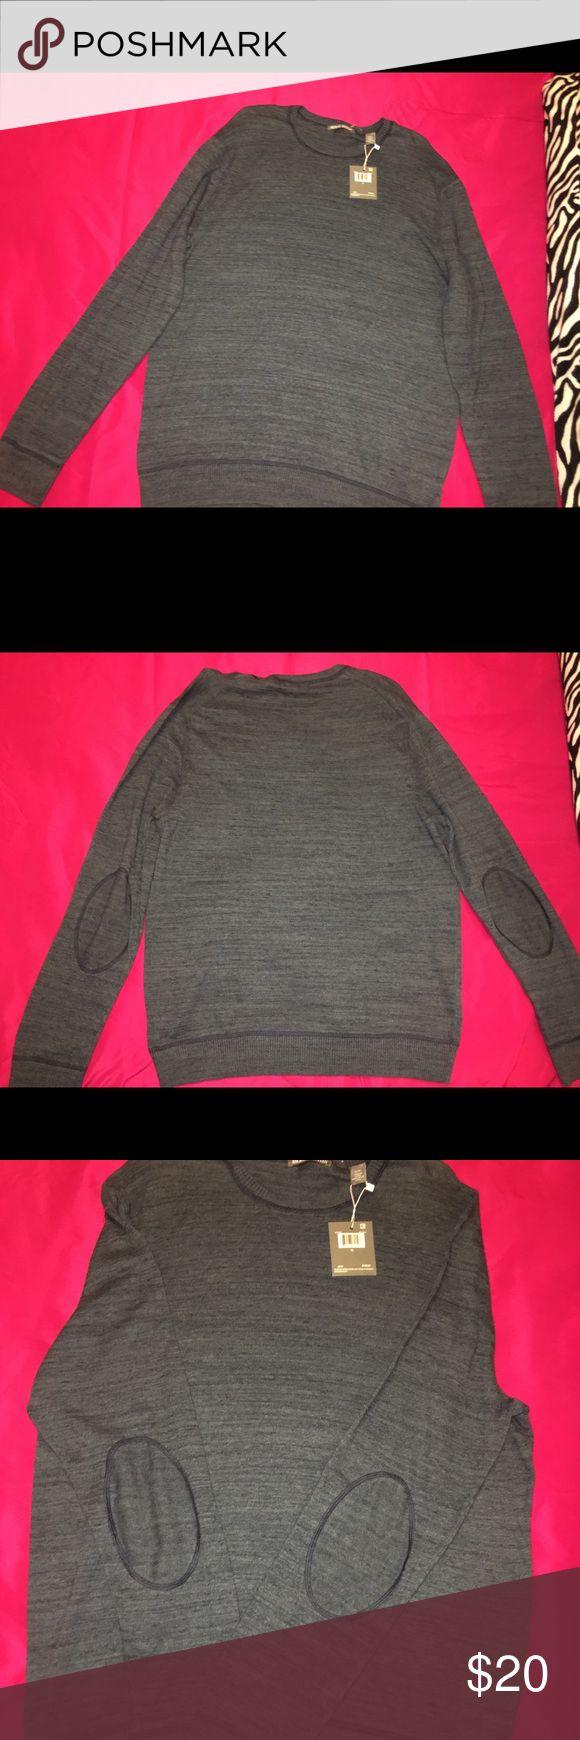 New navy blue Michael Bastian sweater. New navy blue Michael Bastian sweater. Price is firm. Michael Bastian Sweaters